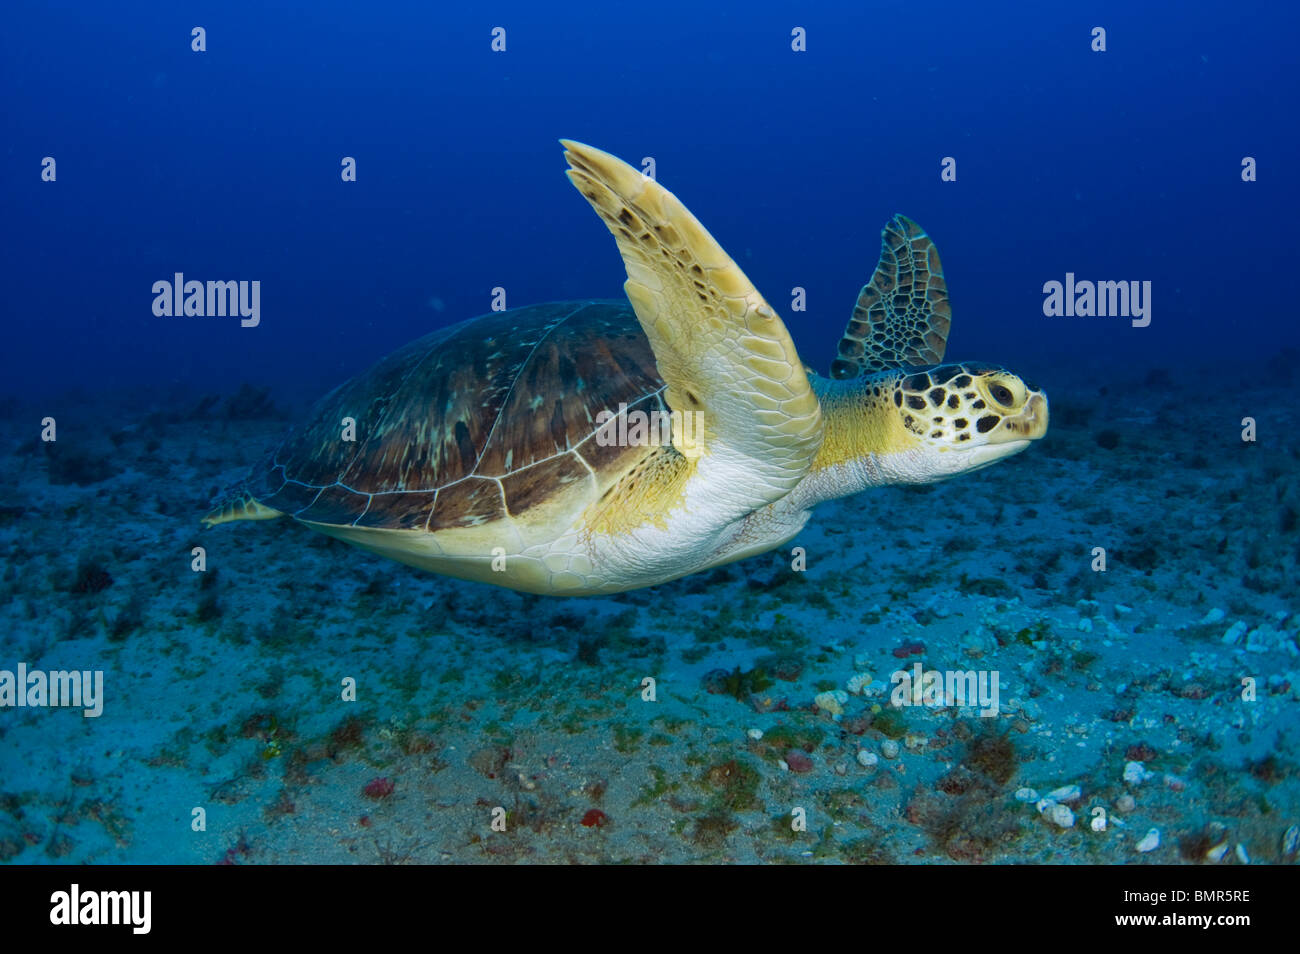 Femmina di tartaruga verde (Chelonia Mydas) alimentazione sulle alghe sott'acqua in Juno Beach, FL. Immagini Stock